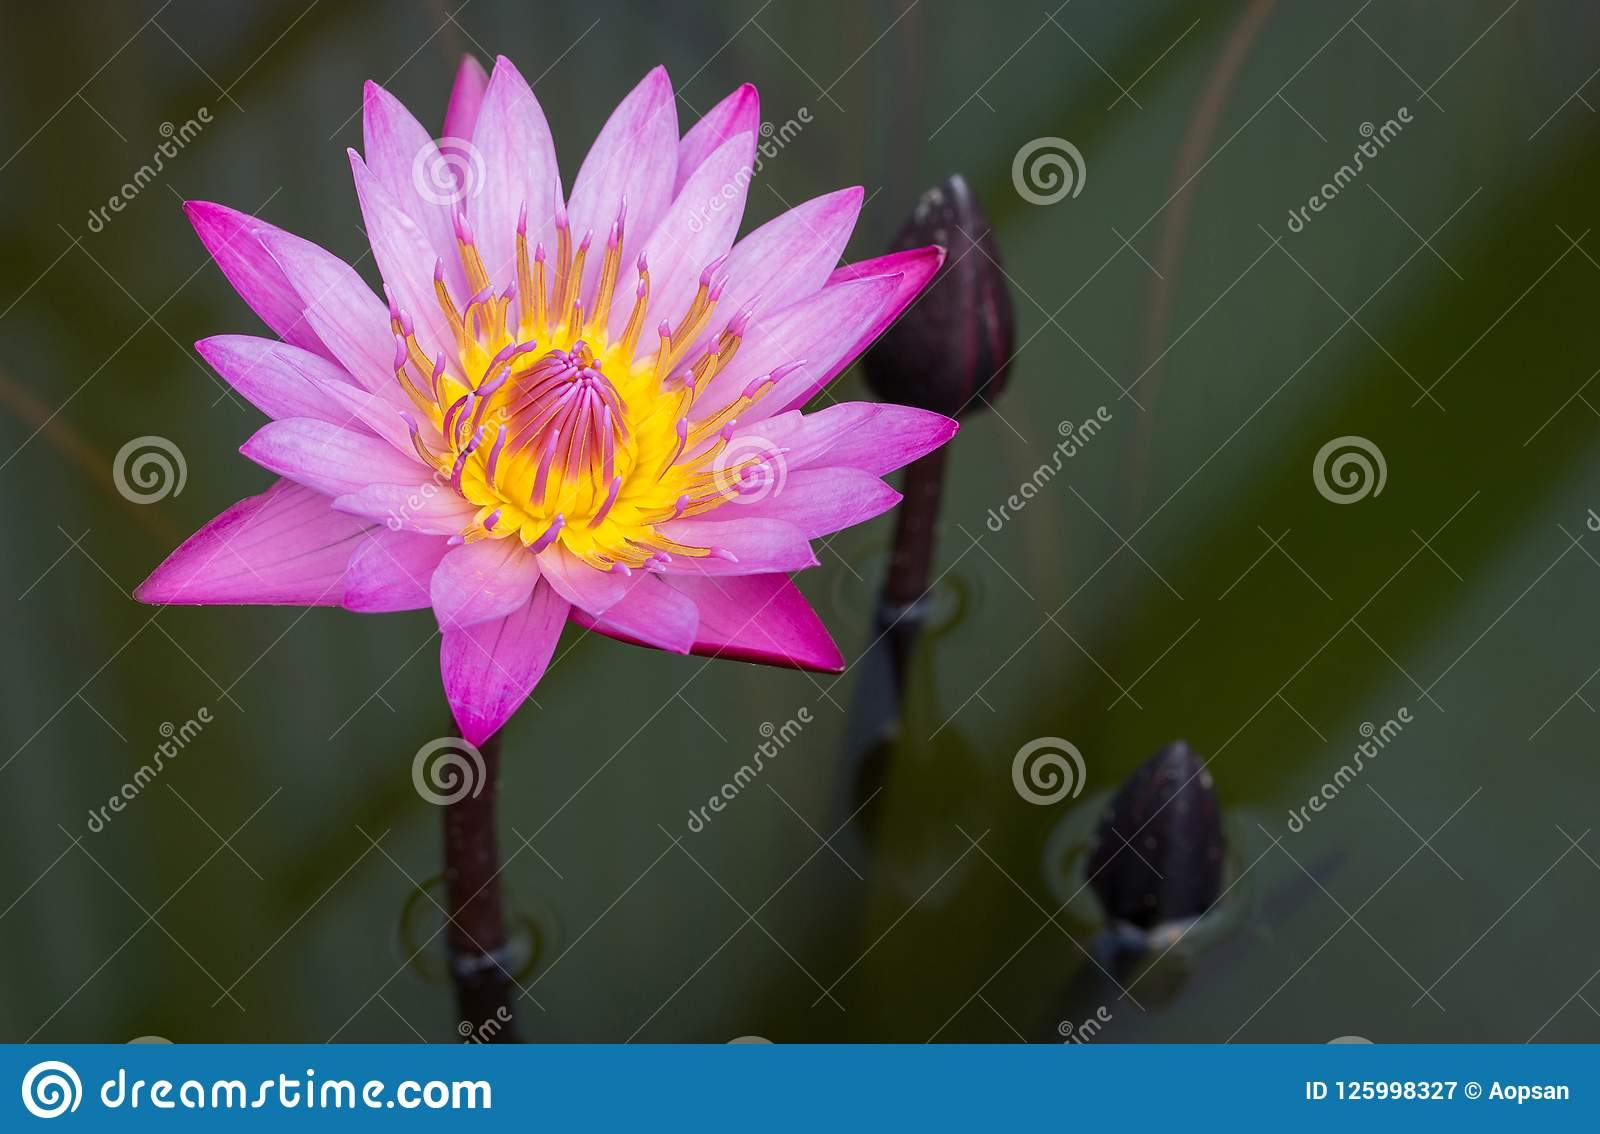 Purple Lotus Flower Stock Image Image Of Blossom Beautiful 125998327